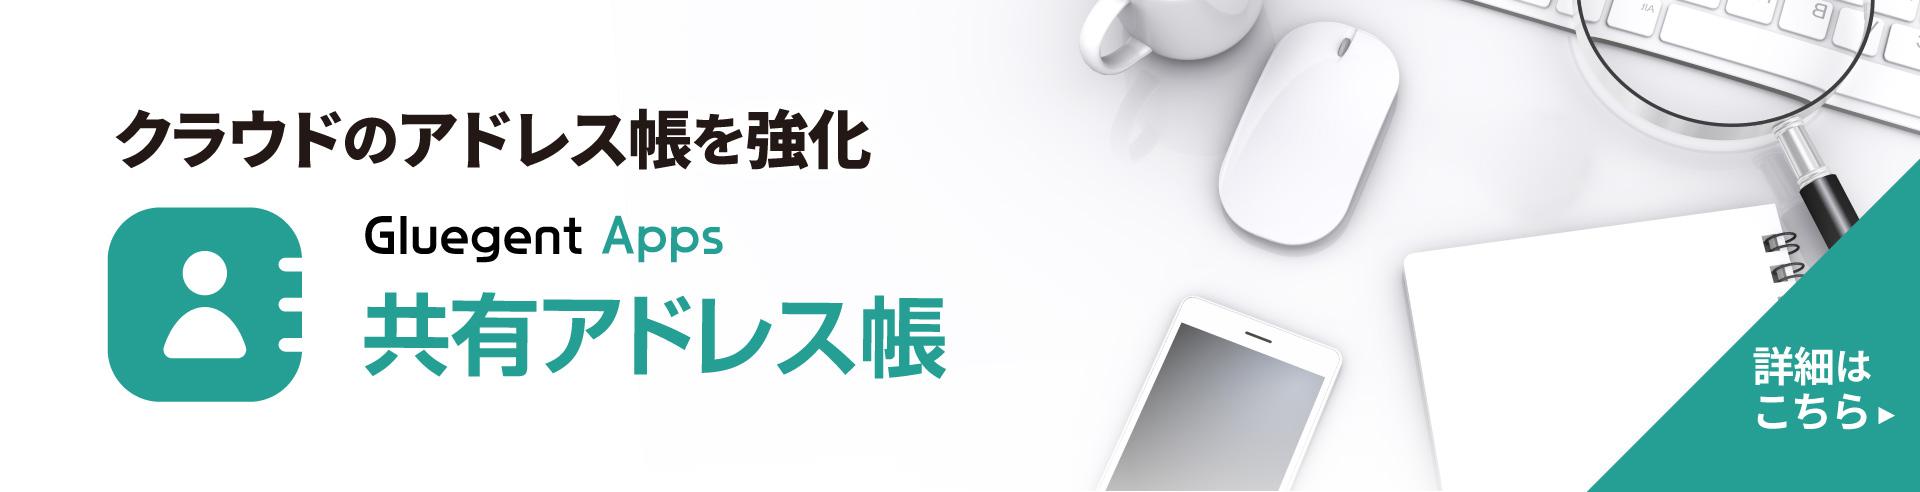 Gluegent Apps 共有アドレス帳